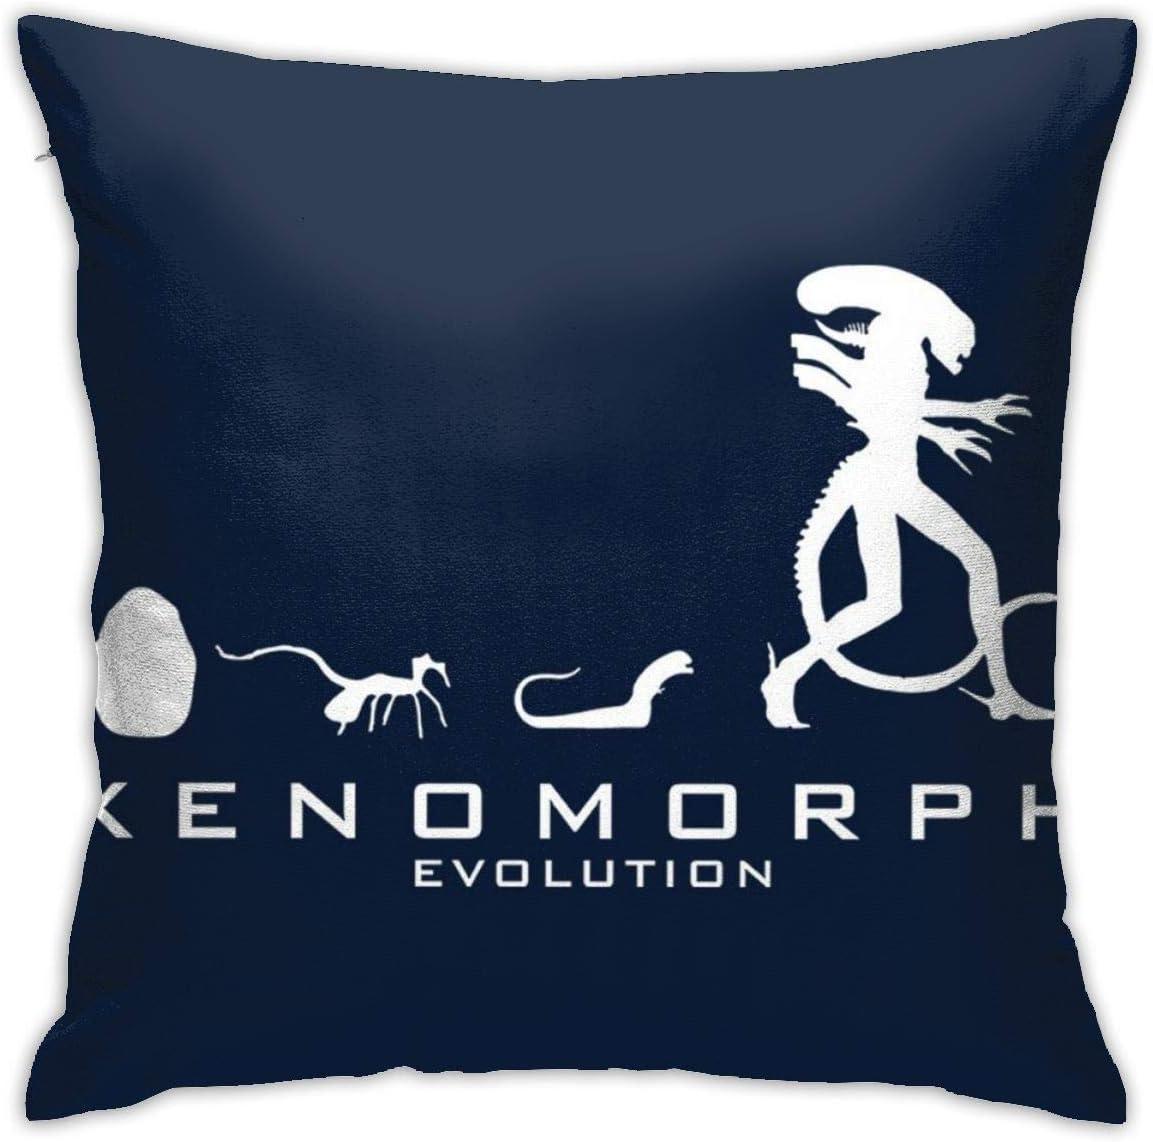 FPDecor Pillow Cases Double-Sided Printing Hidden Zip Pillowcase Xenomorph Evolution Alien Pillowcase Beautiful Printed Pattern Pillowcase 18 * 18inch